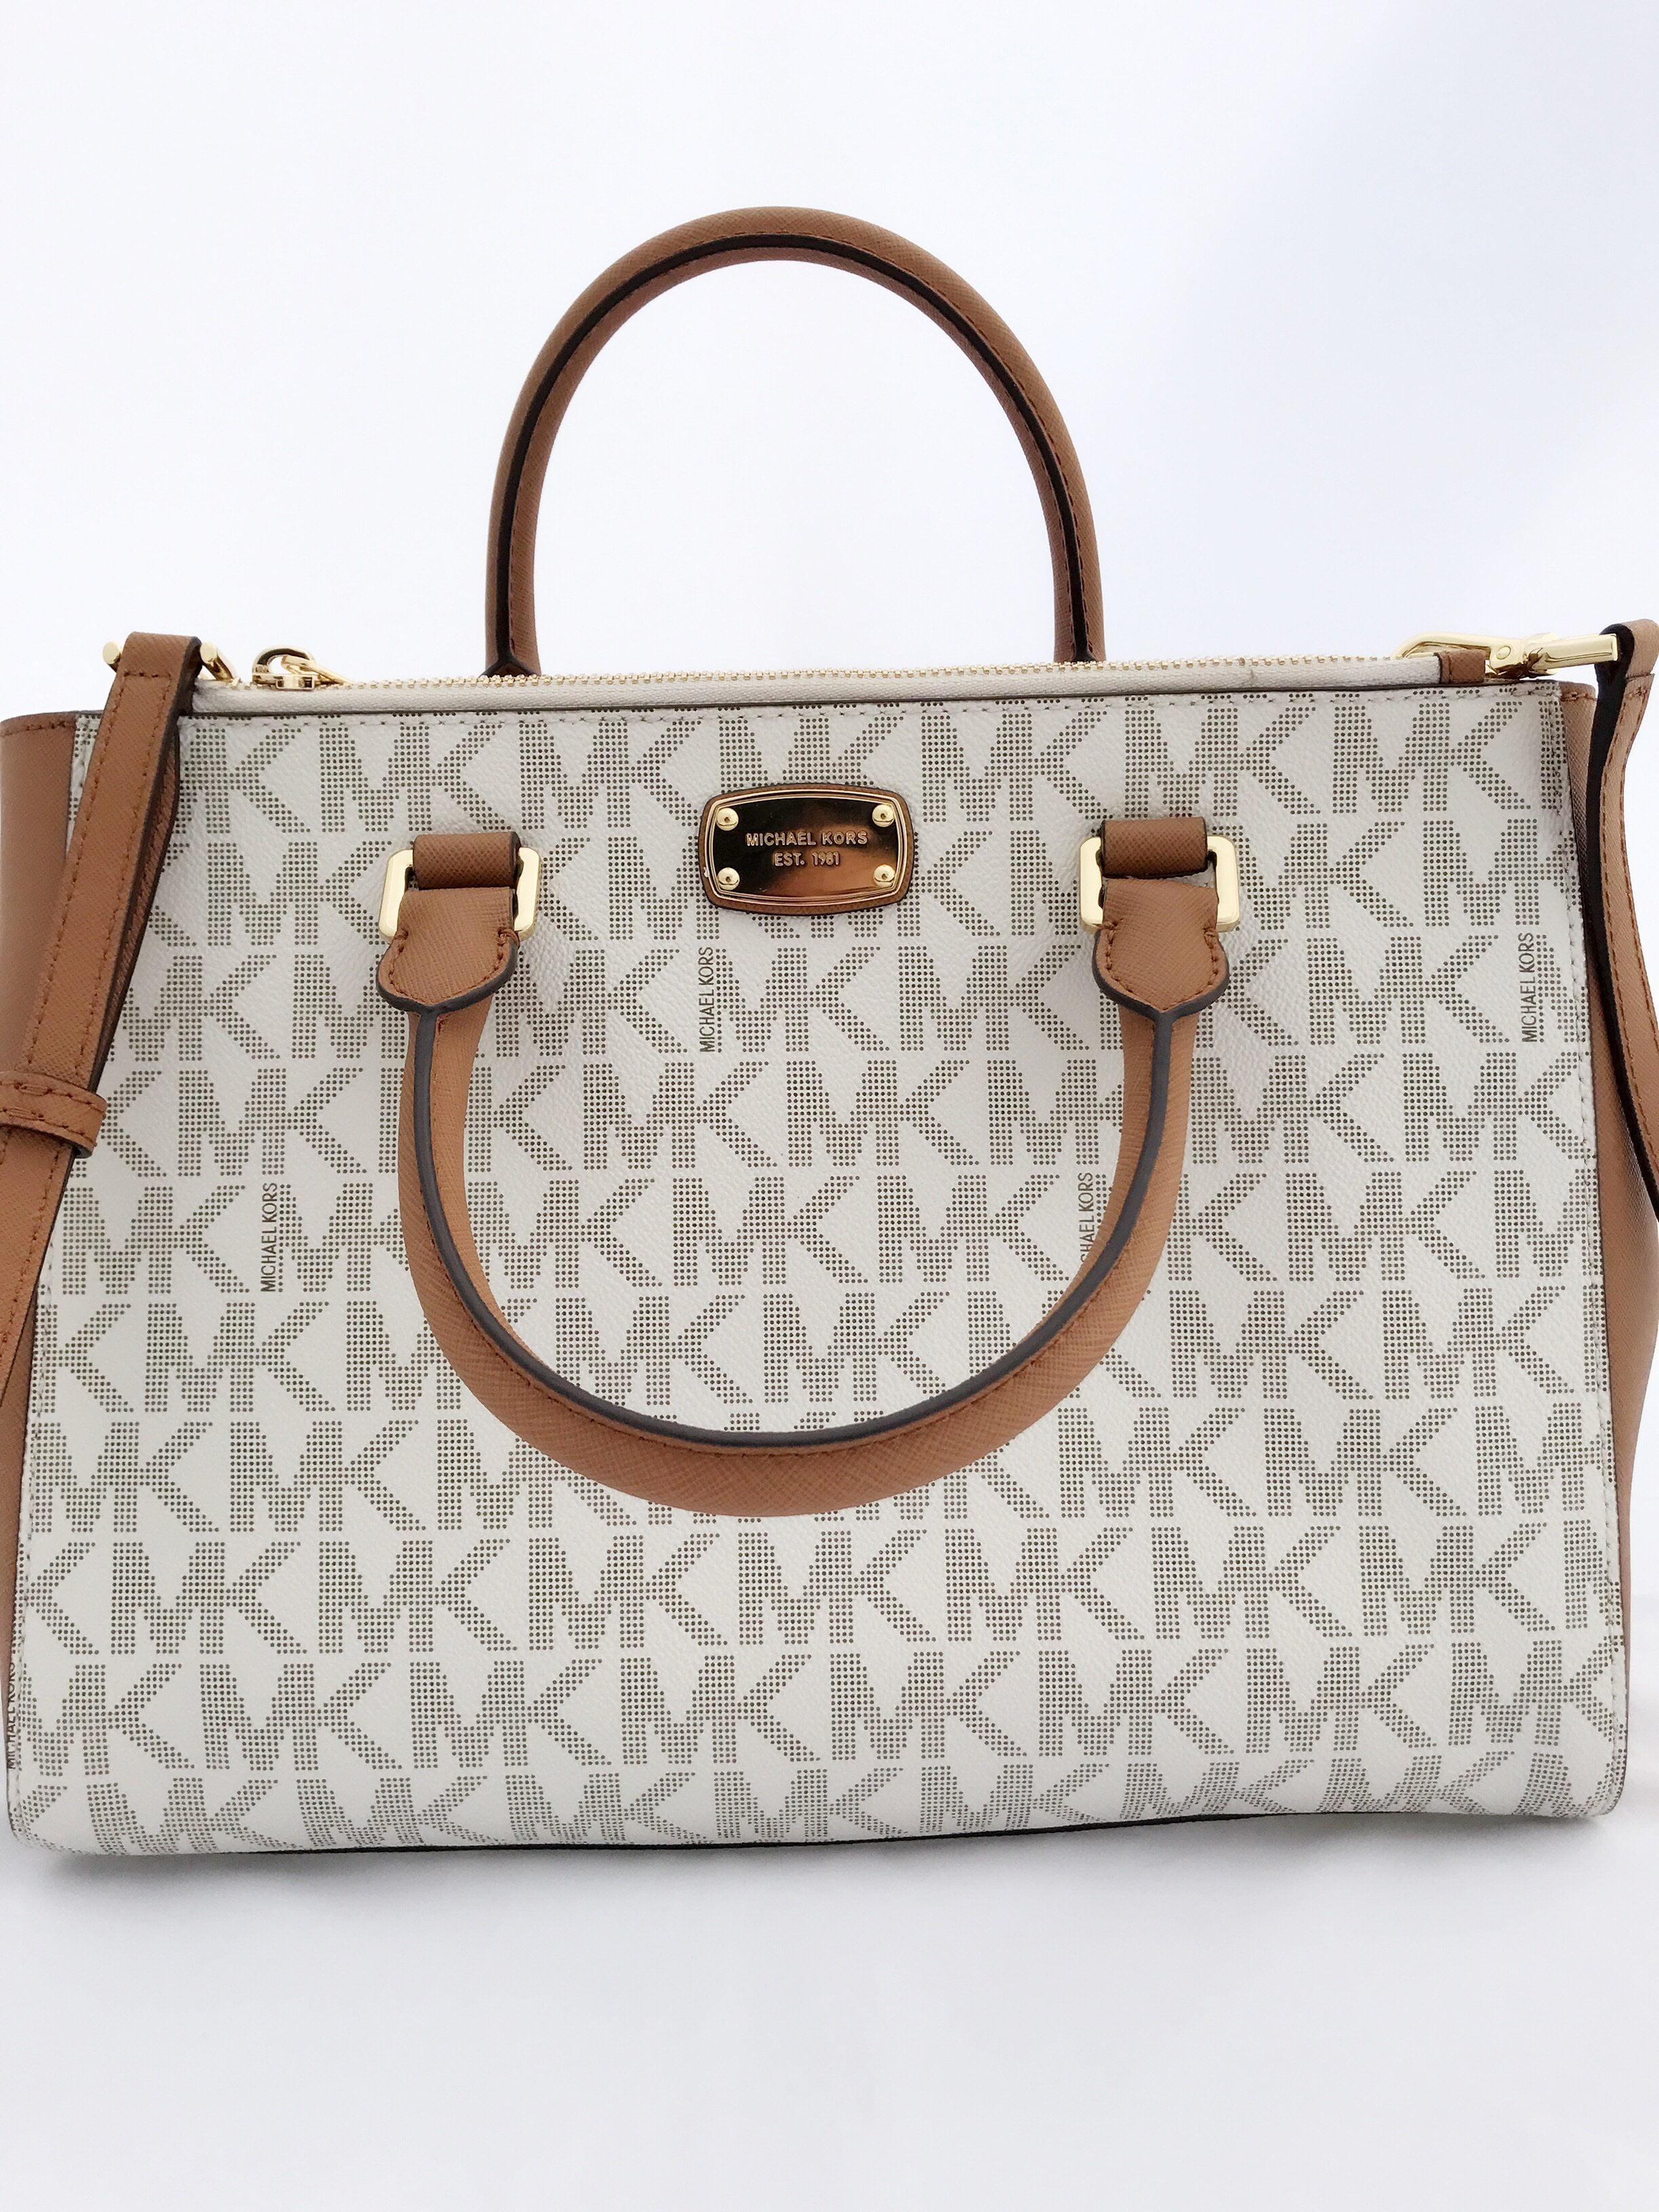 2b4212df7f16dd Michael Kors - Michael Kors Kellen Medium Satchel Leather PVC Crossbody Bag  Vanilla MK Acorn - Walmart.com